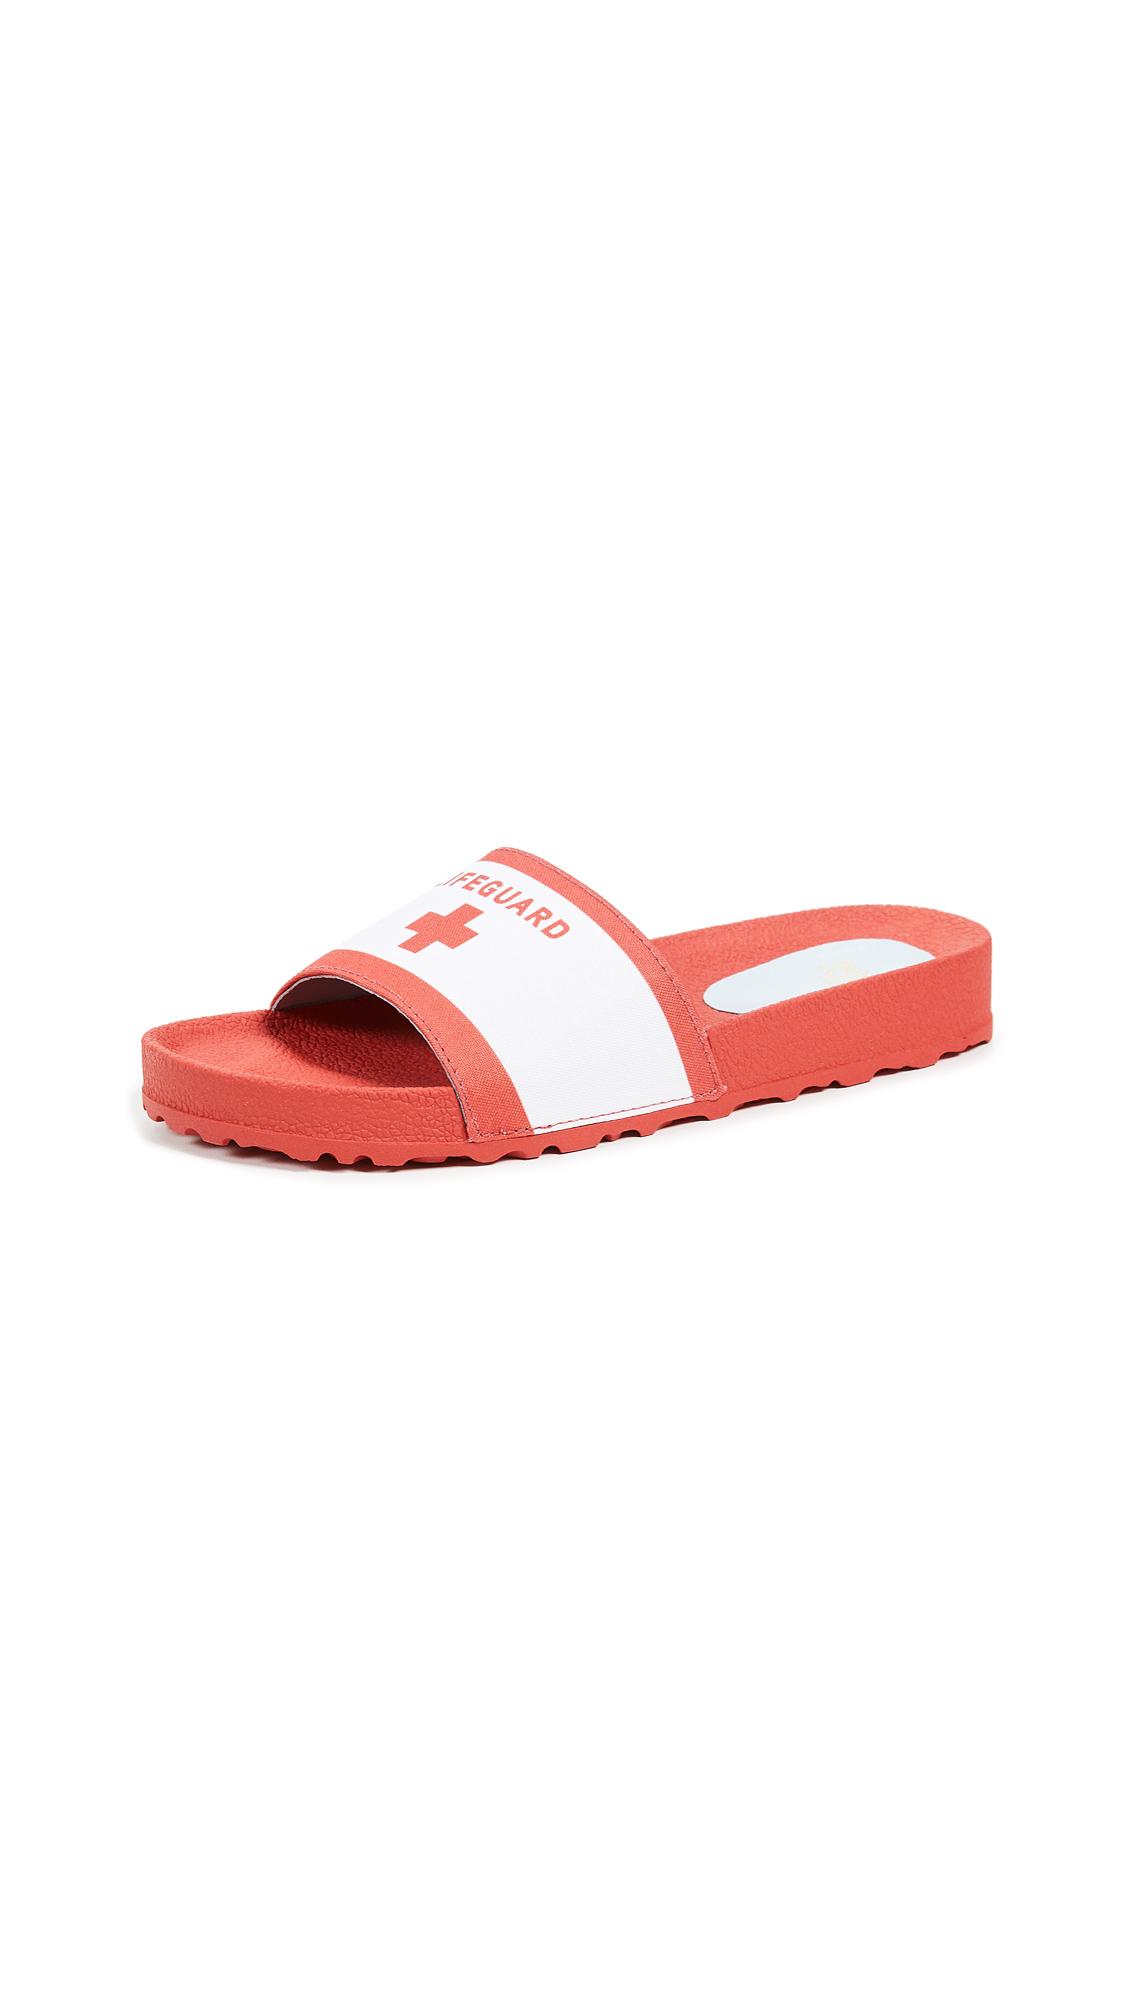 Frances Valentine Mai Lifeguard Slides